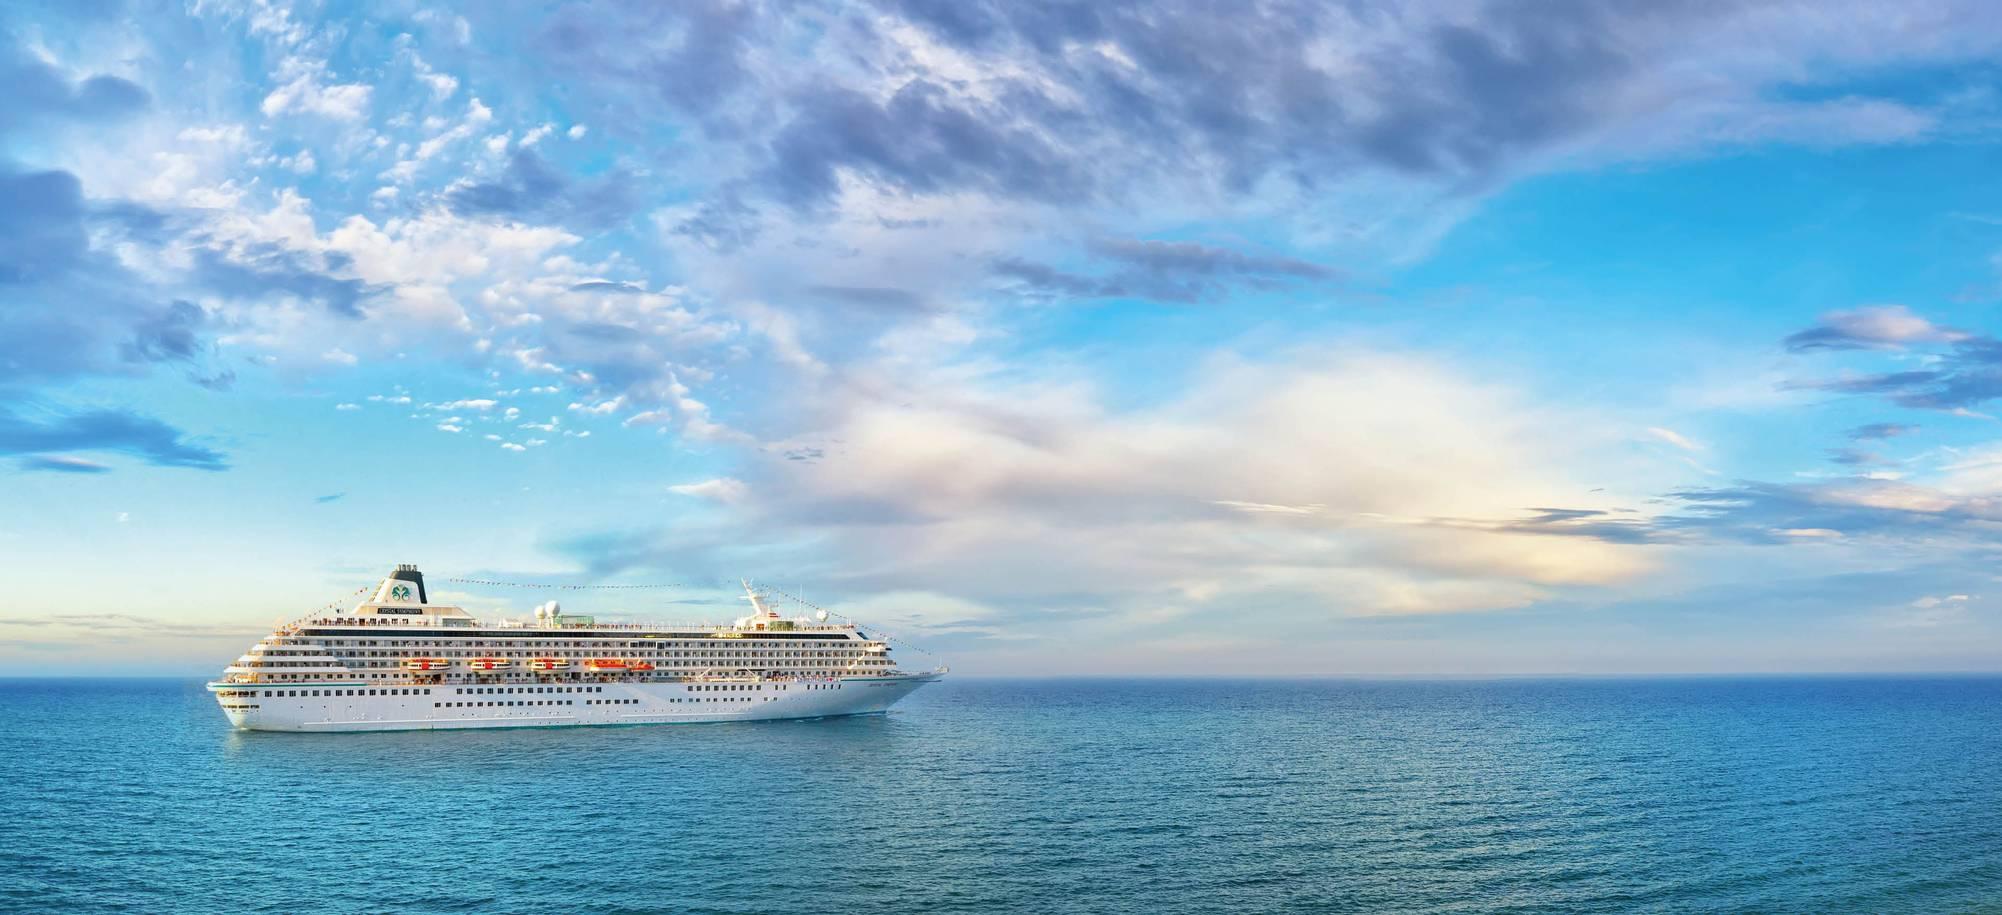 Ship Images9.jpg